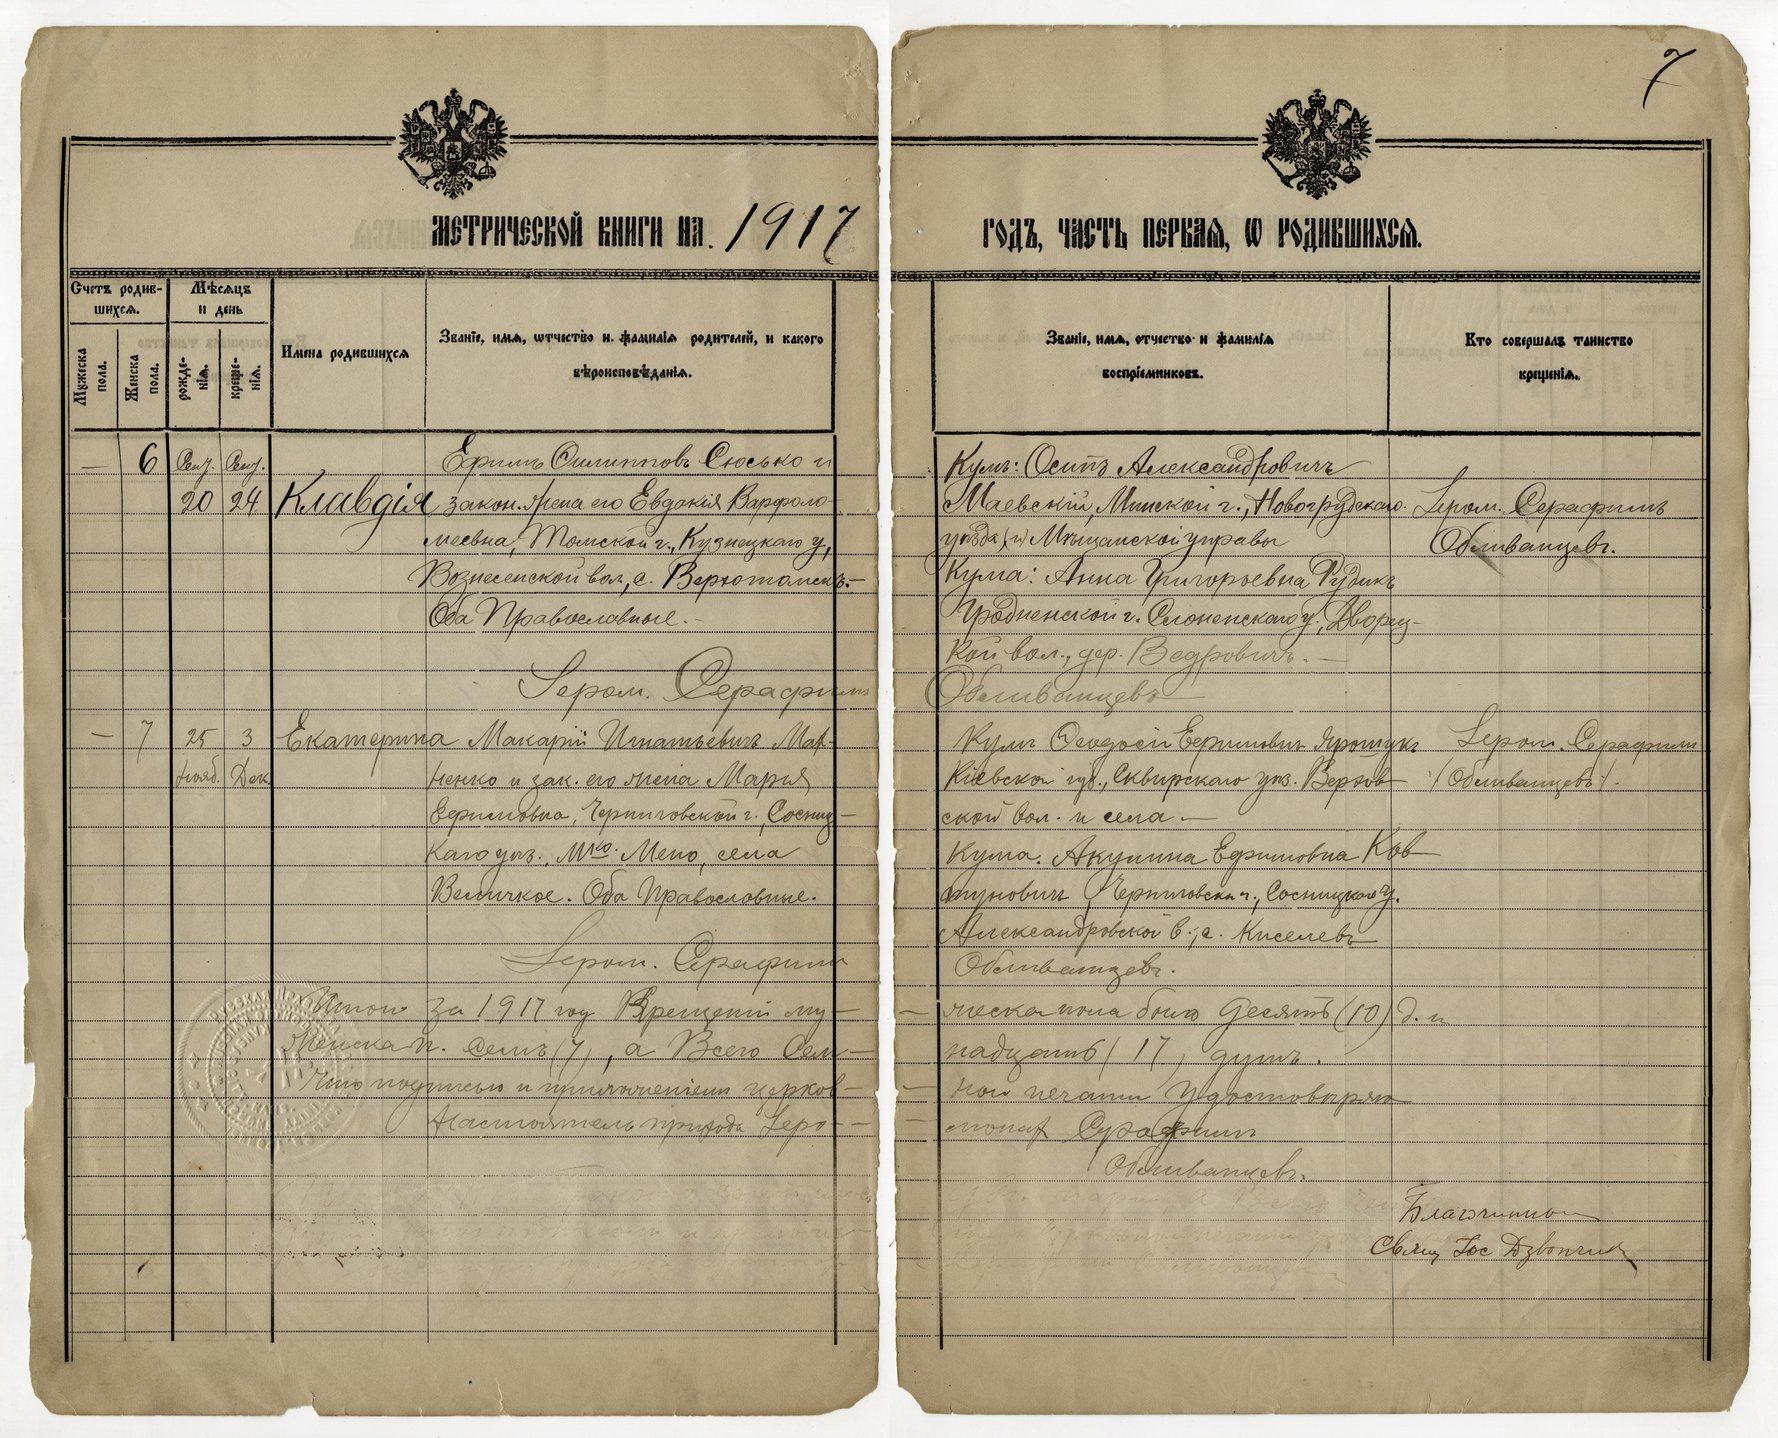 Birth, marriage and death register, Holy Trinity Russian Orthodox Church, Kansas City, Kansas - 1917 - 007 - Birth